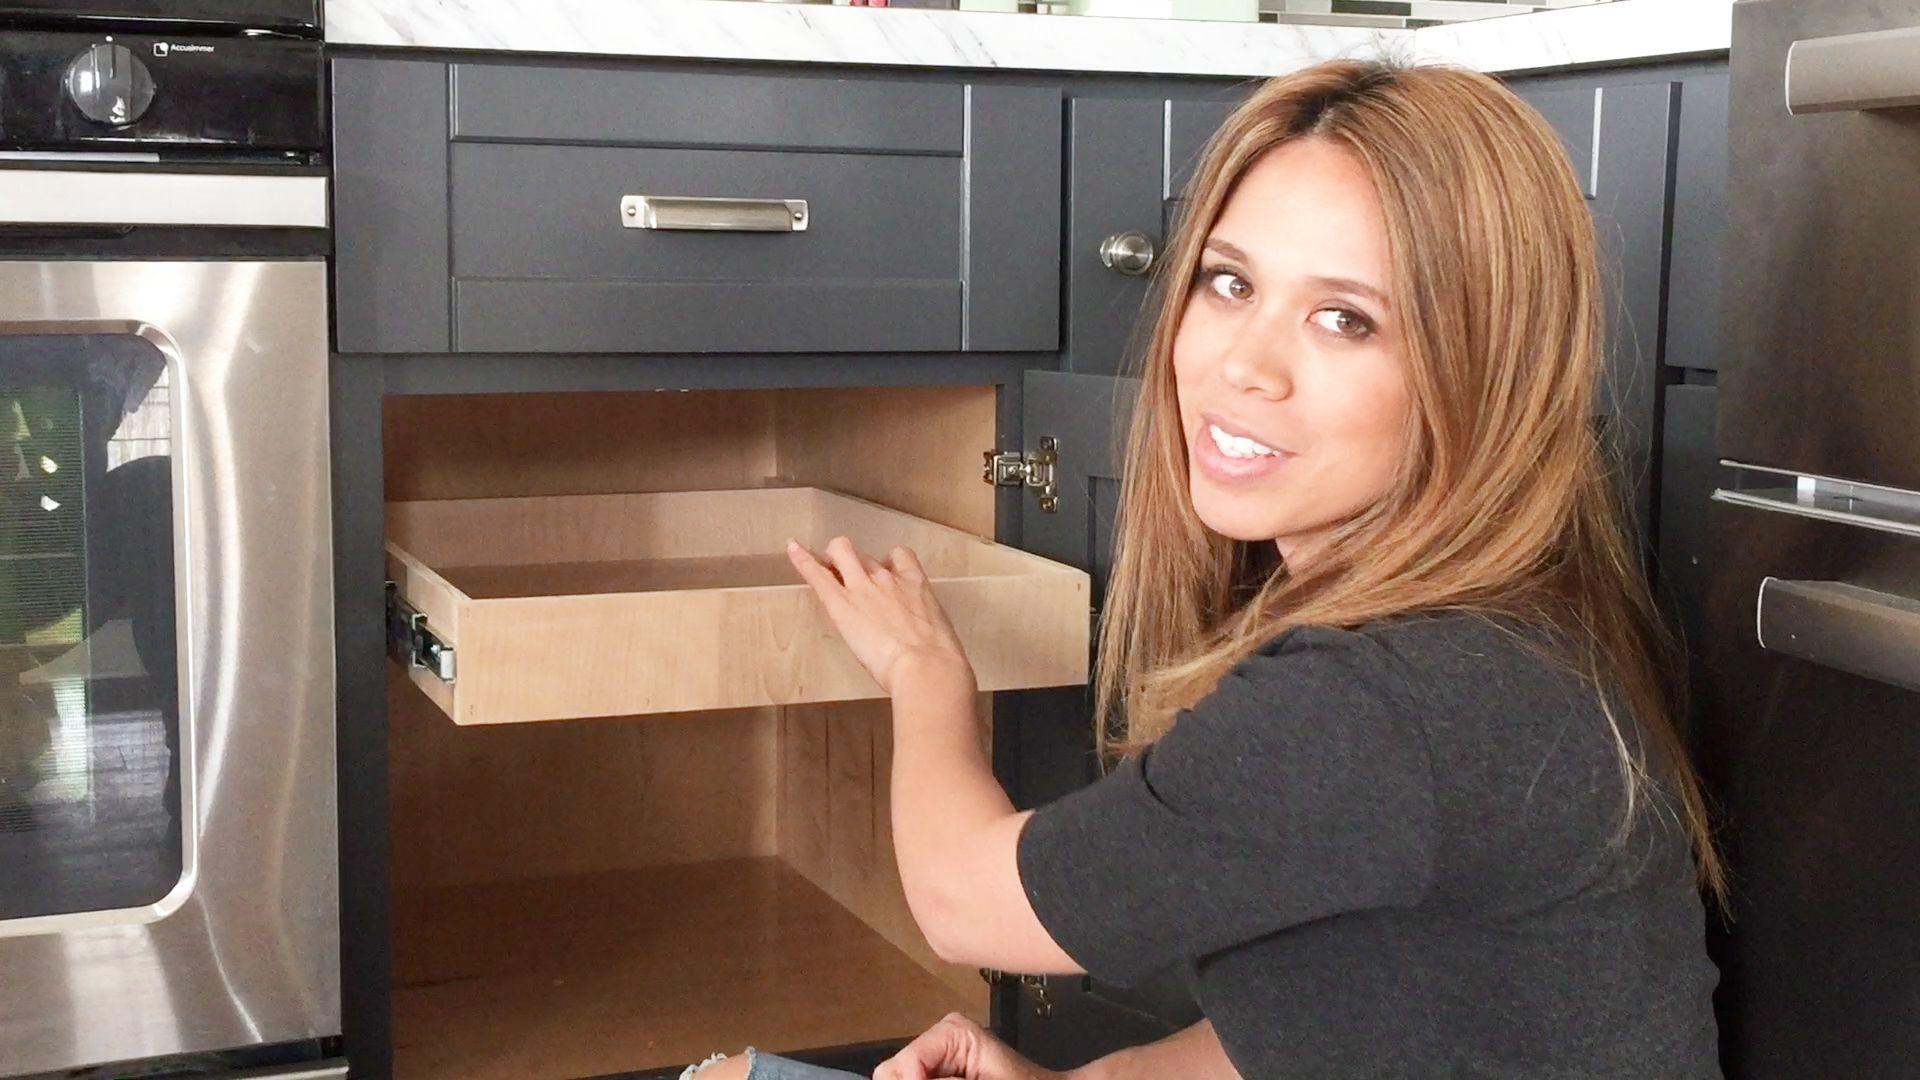 Ryobi Nation Pull Out Drawer Tutorial Diy Kitchen Cabinets Diy Cabinets Diy Furniture